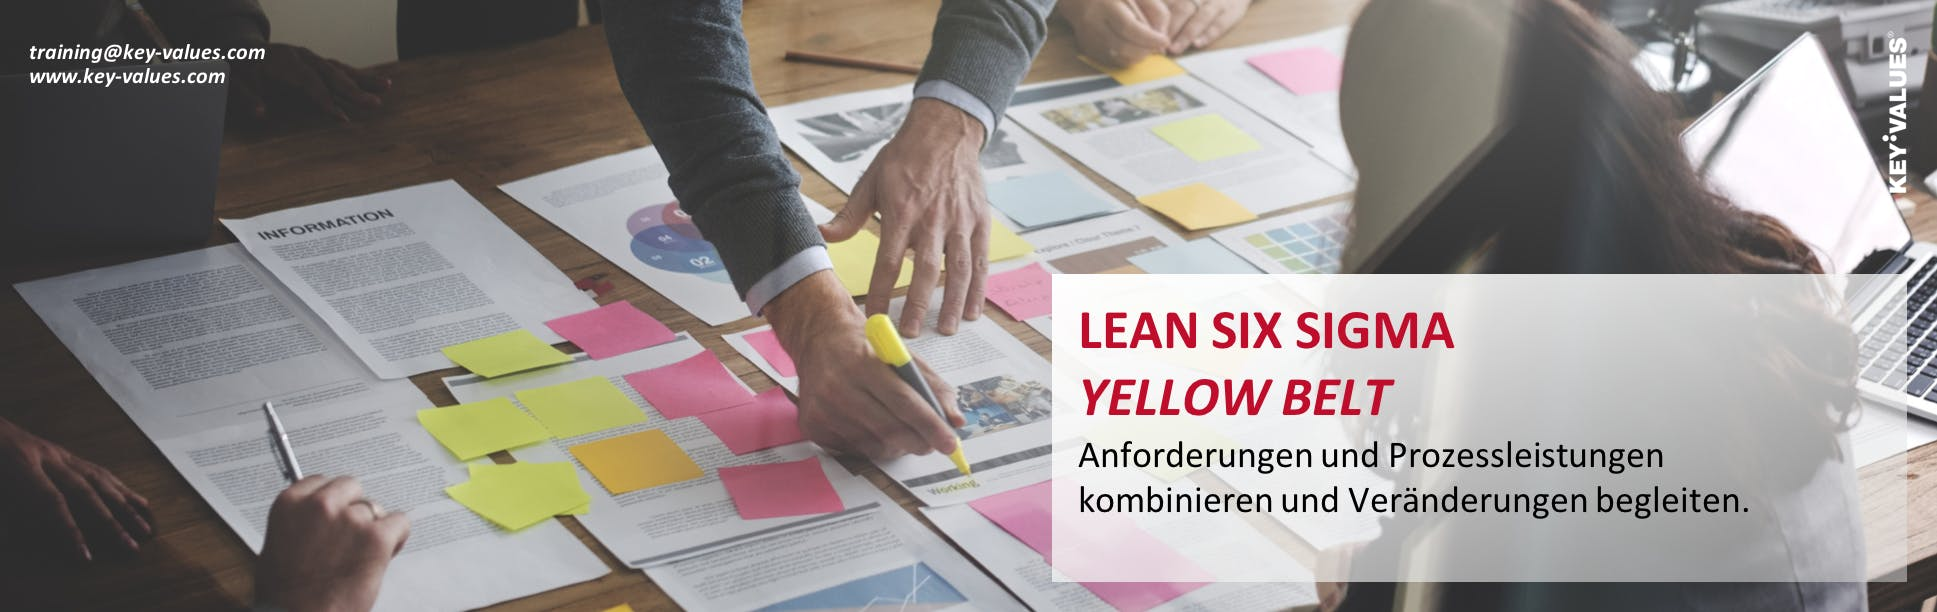 Lean Six Sigma Yellow Belt - Anforderungen un